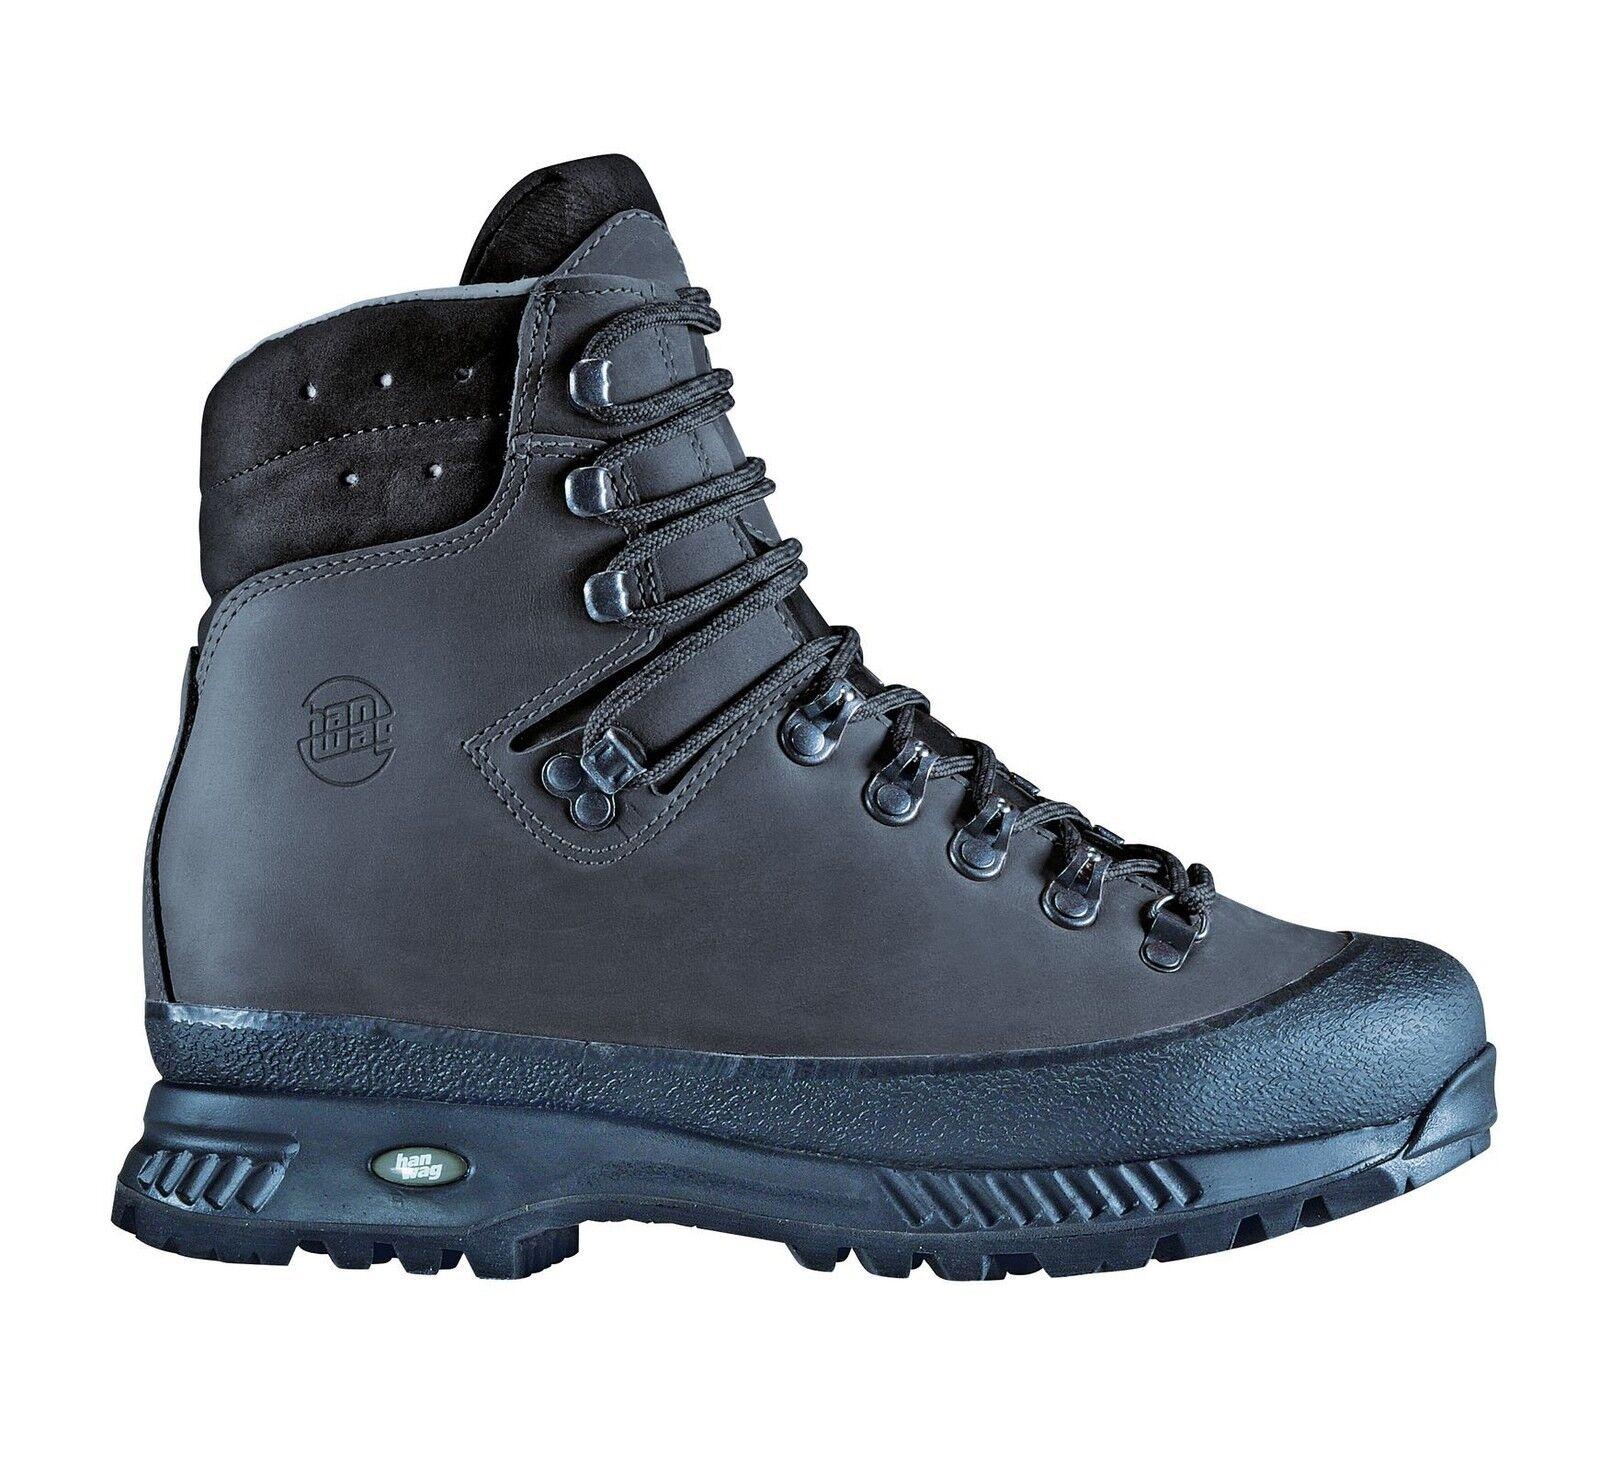 Hanwag zapatos de montaña  Yukon Men cuero tamaño 13 - 48,5 cenizas